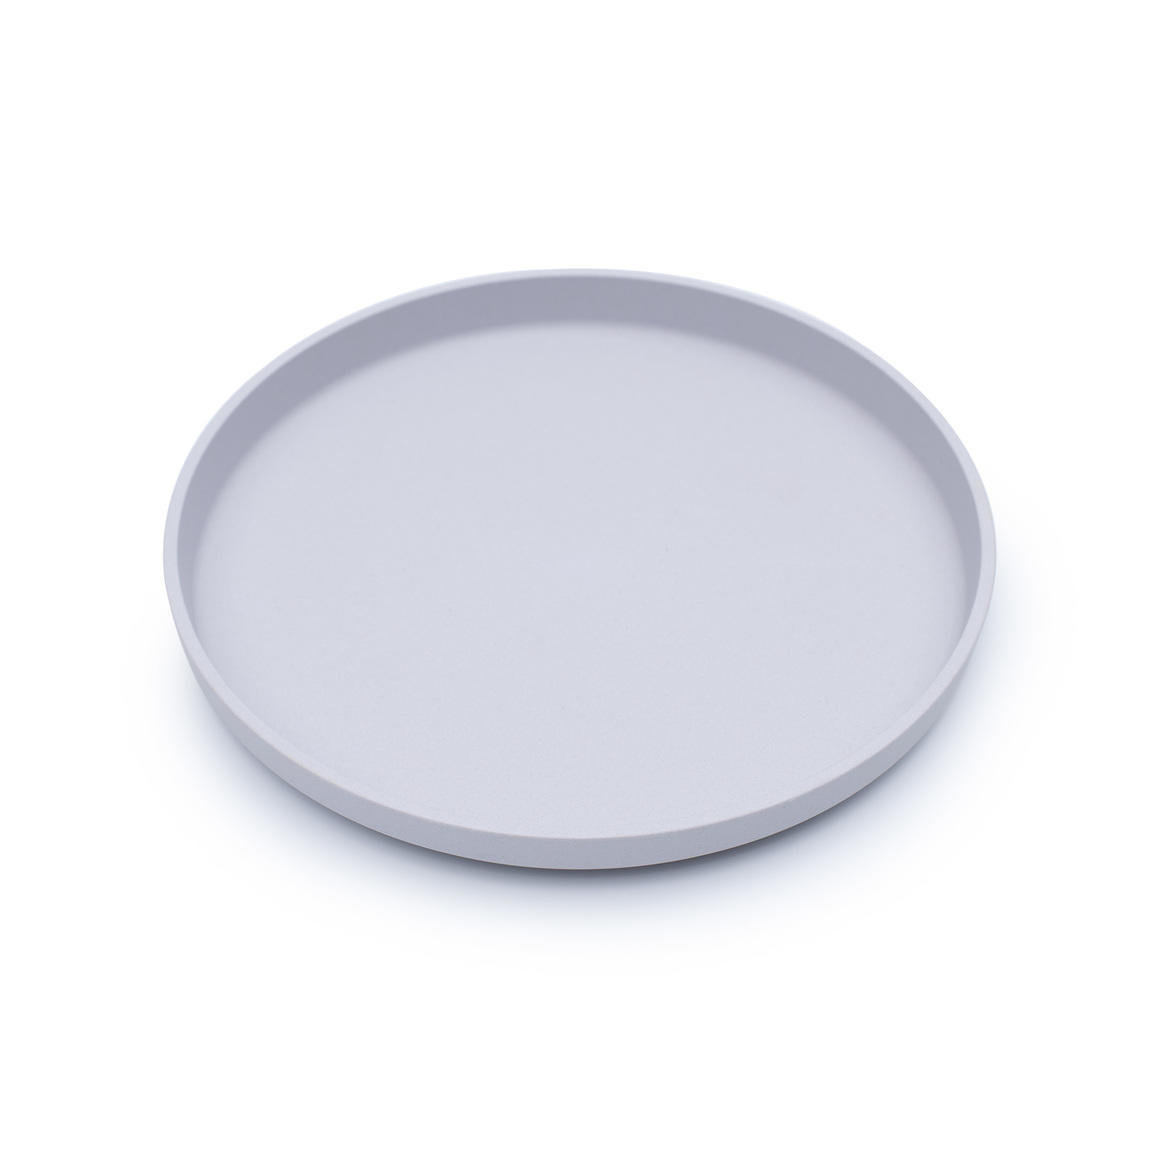 Plant-Based Plate -Grey   Trada Marketplace